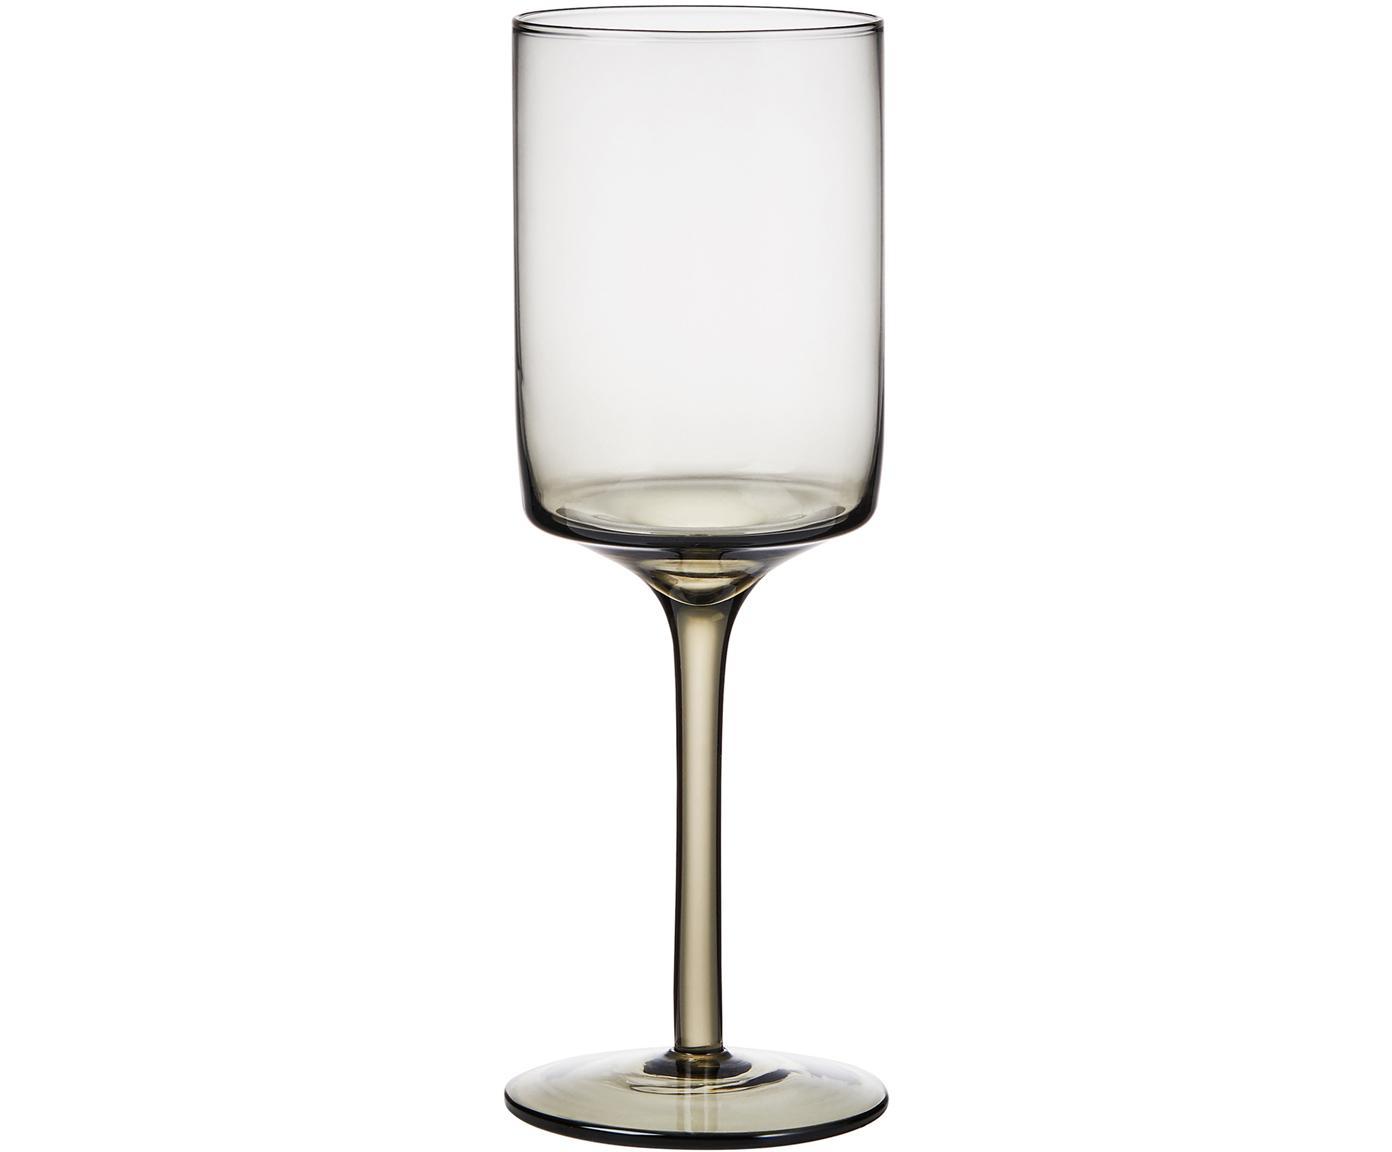 Bicchiere da vino Form 4 pz, Vetro, Antracite, Ø 8 x Alt. 23 cm